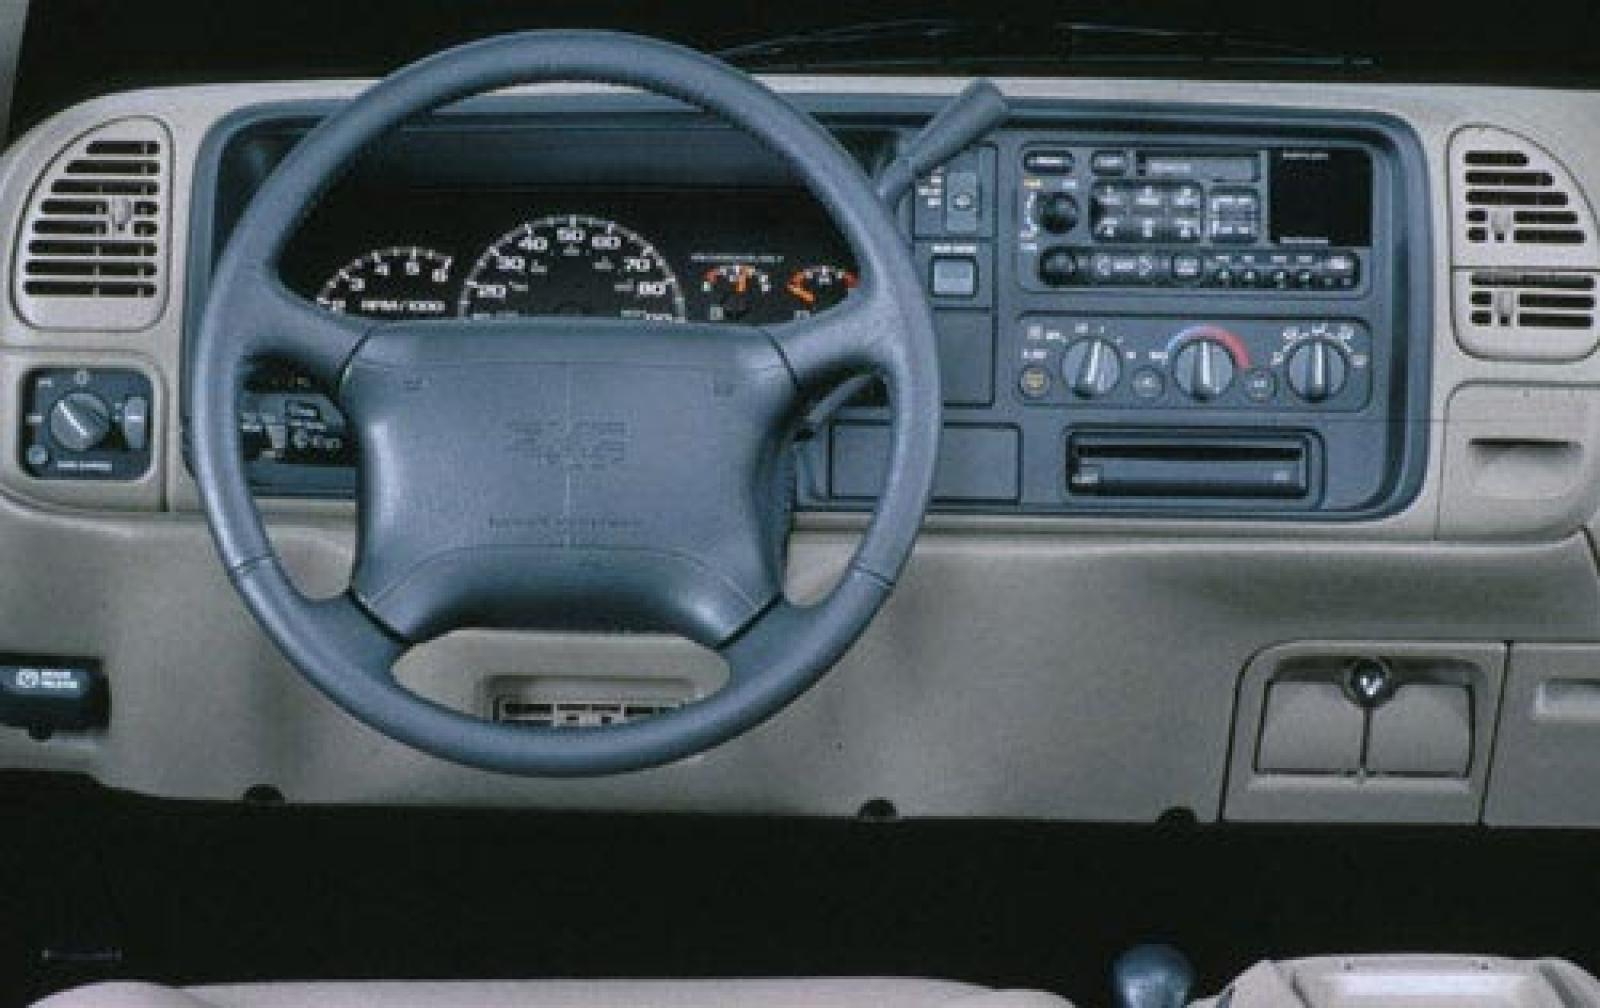 Gallery 1999 Dodge Ram 2500 Interior 1999 Dodge Ram 2500